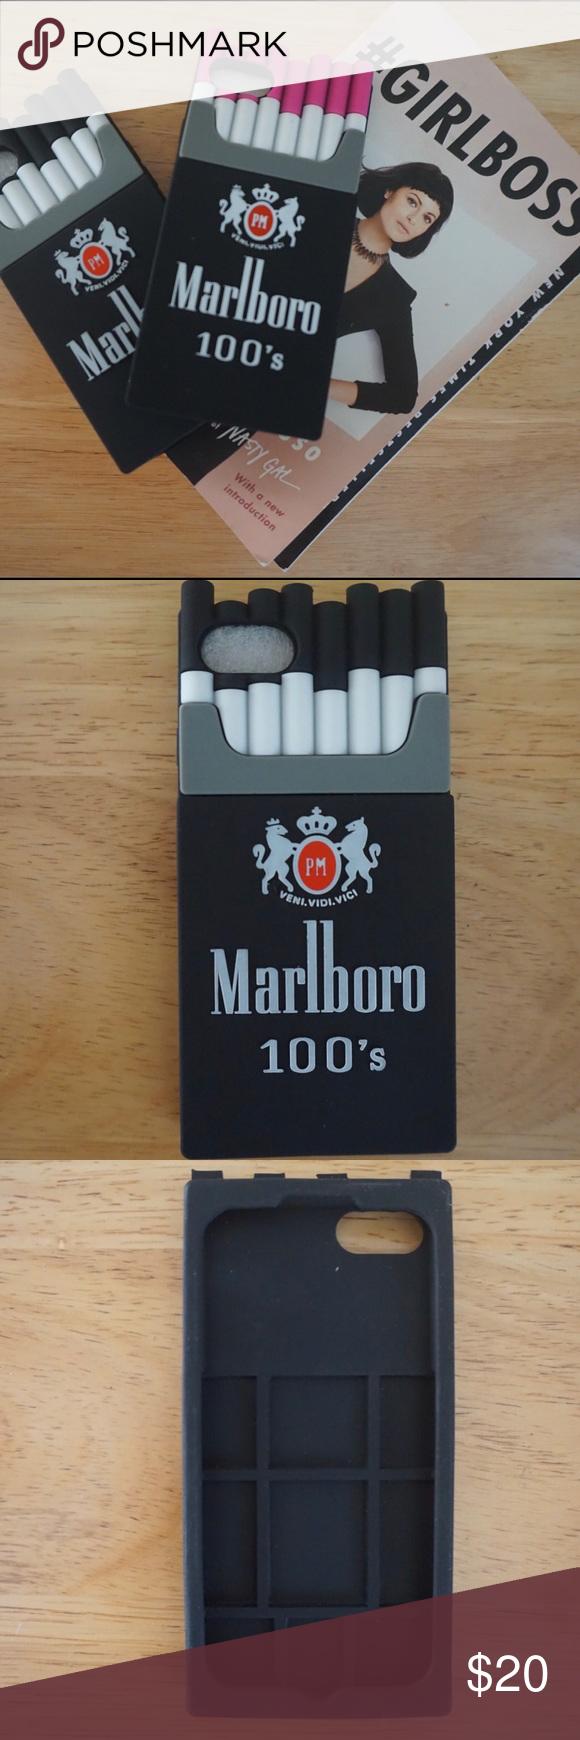 ‼️SALE‼️TRENDY Marlboro Rubber IPHONE 7s,black Boutique